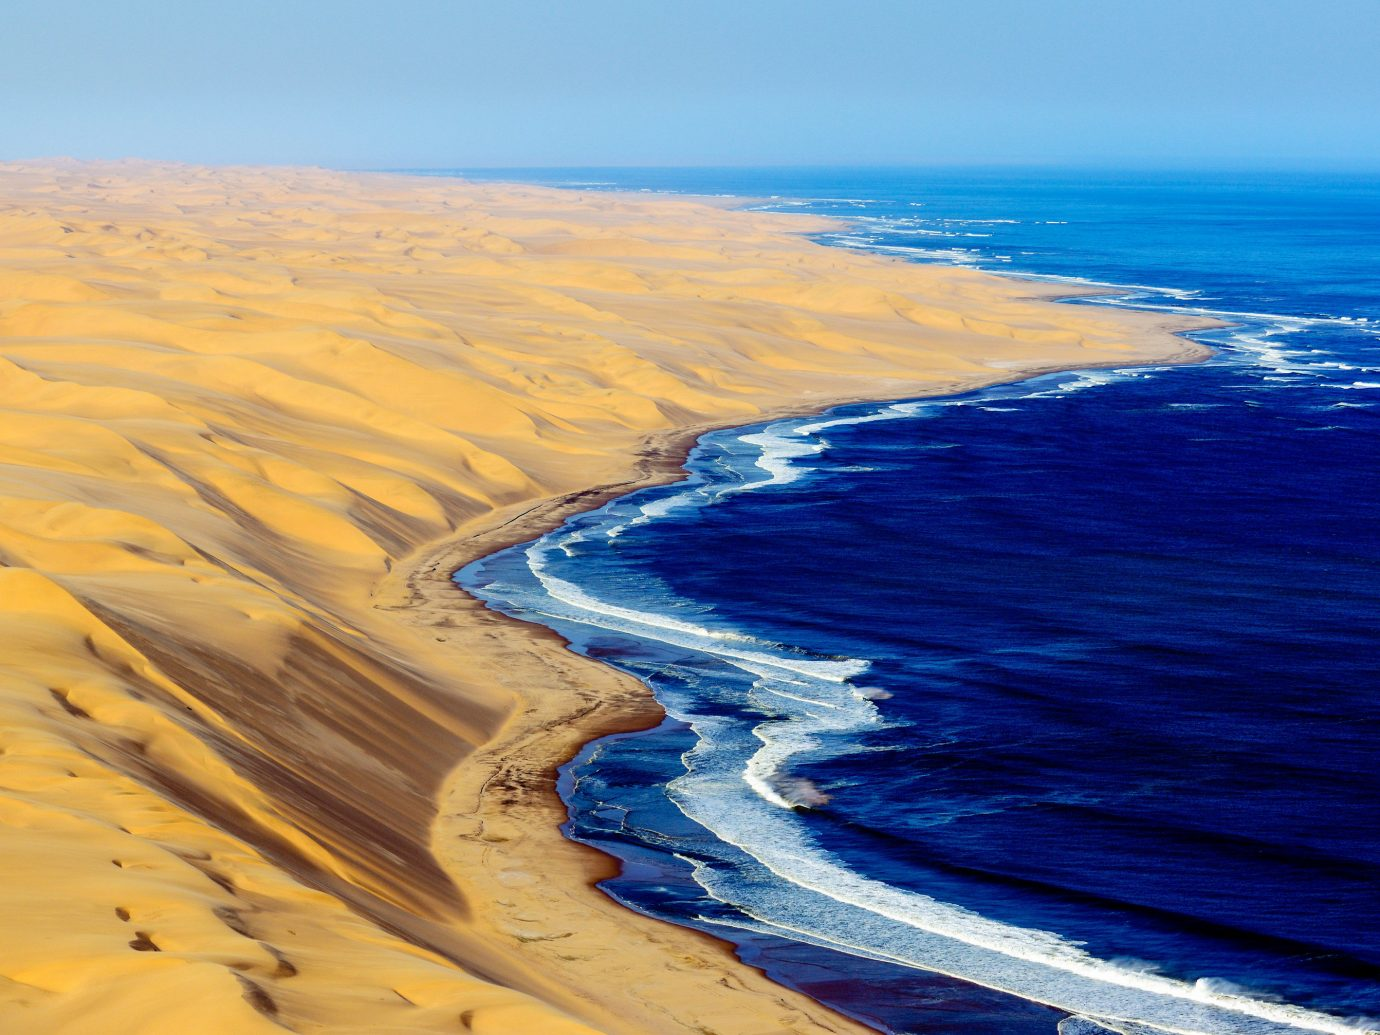 Spring Trips Trip Ideas Coast Sea shore sky Ocean coastal and oceanic landforms horizon sand Beach terrain wave headland promontory dune aeolian landform ecoregion cape landscape